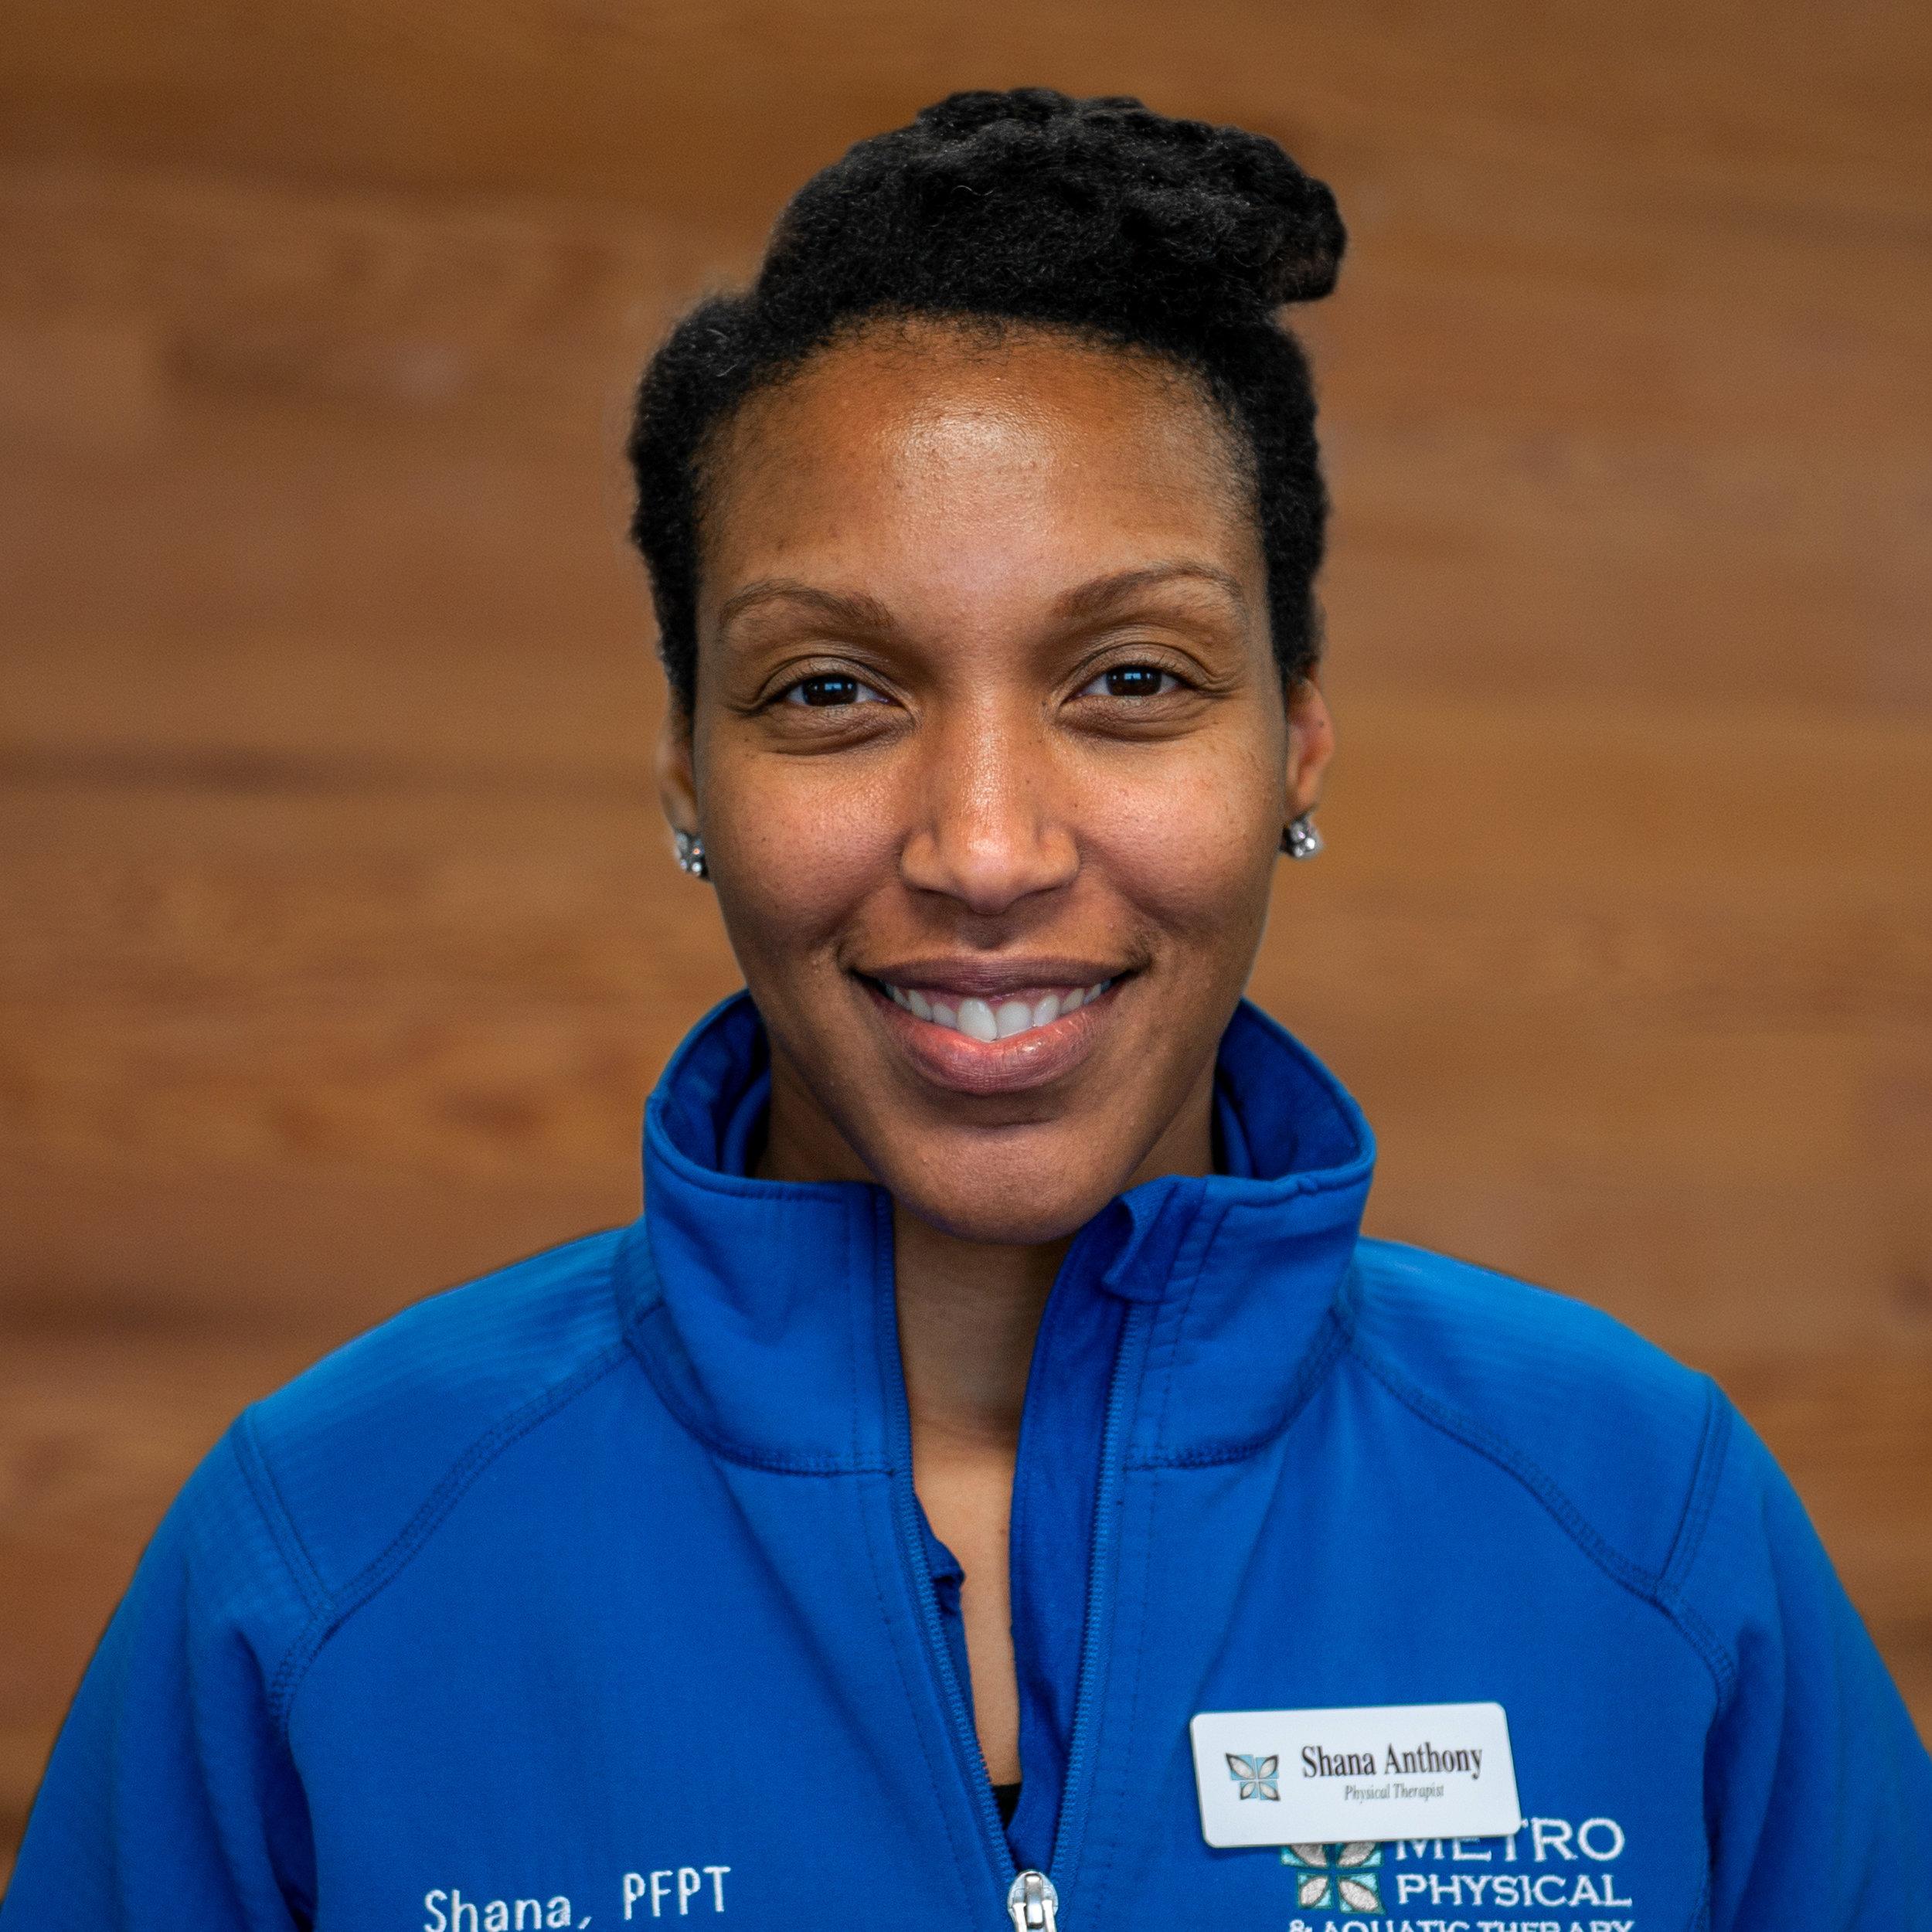 Shana Anthony, PT, DPT, GTS - Women's & Men's HealthPelvic Floor DysfunctionOrthopedicSports/DanceManual Therapy